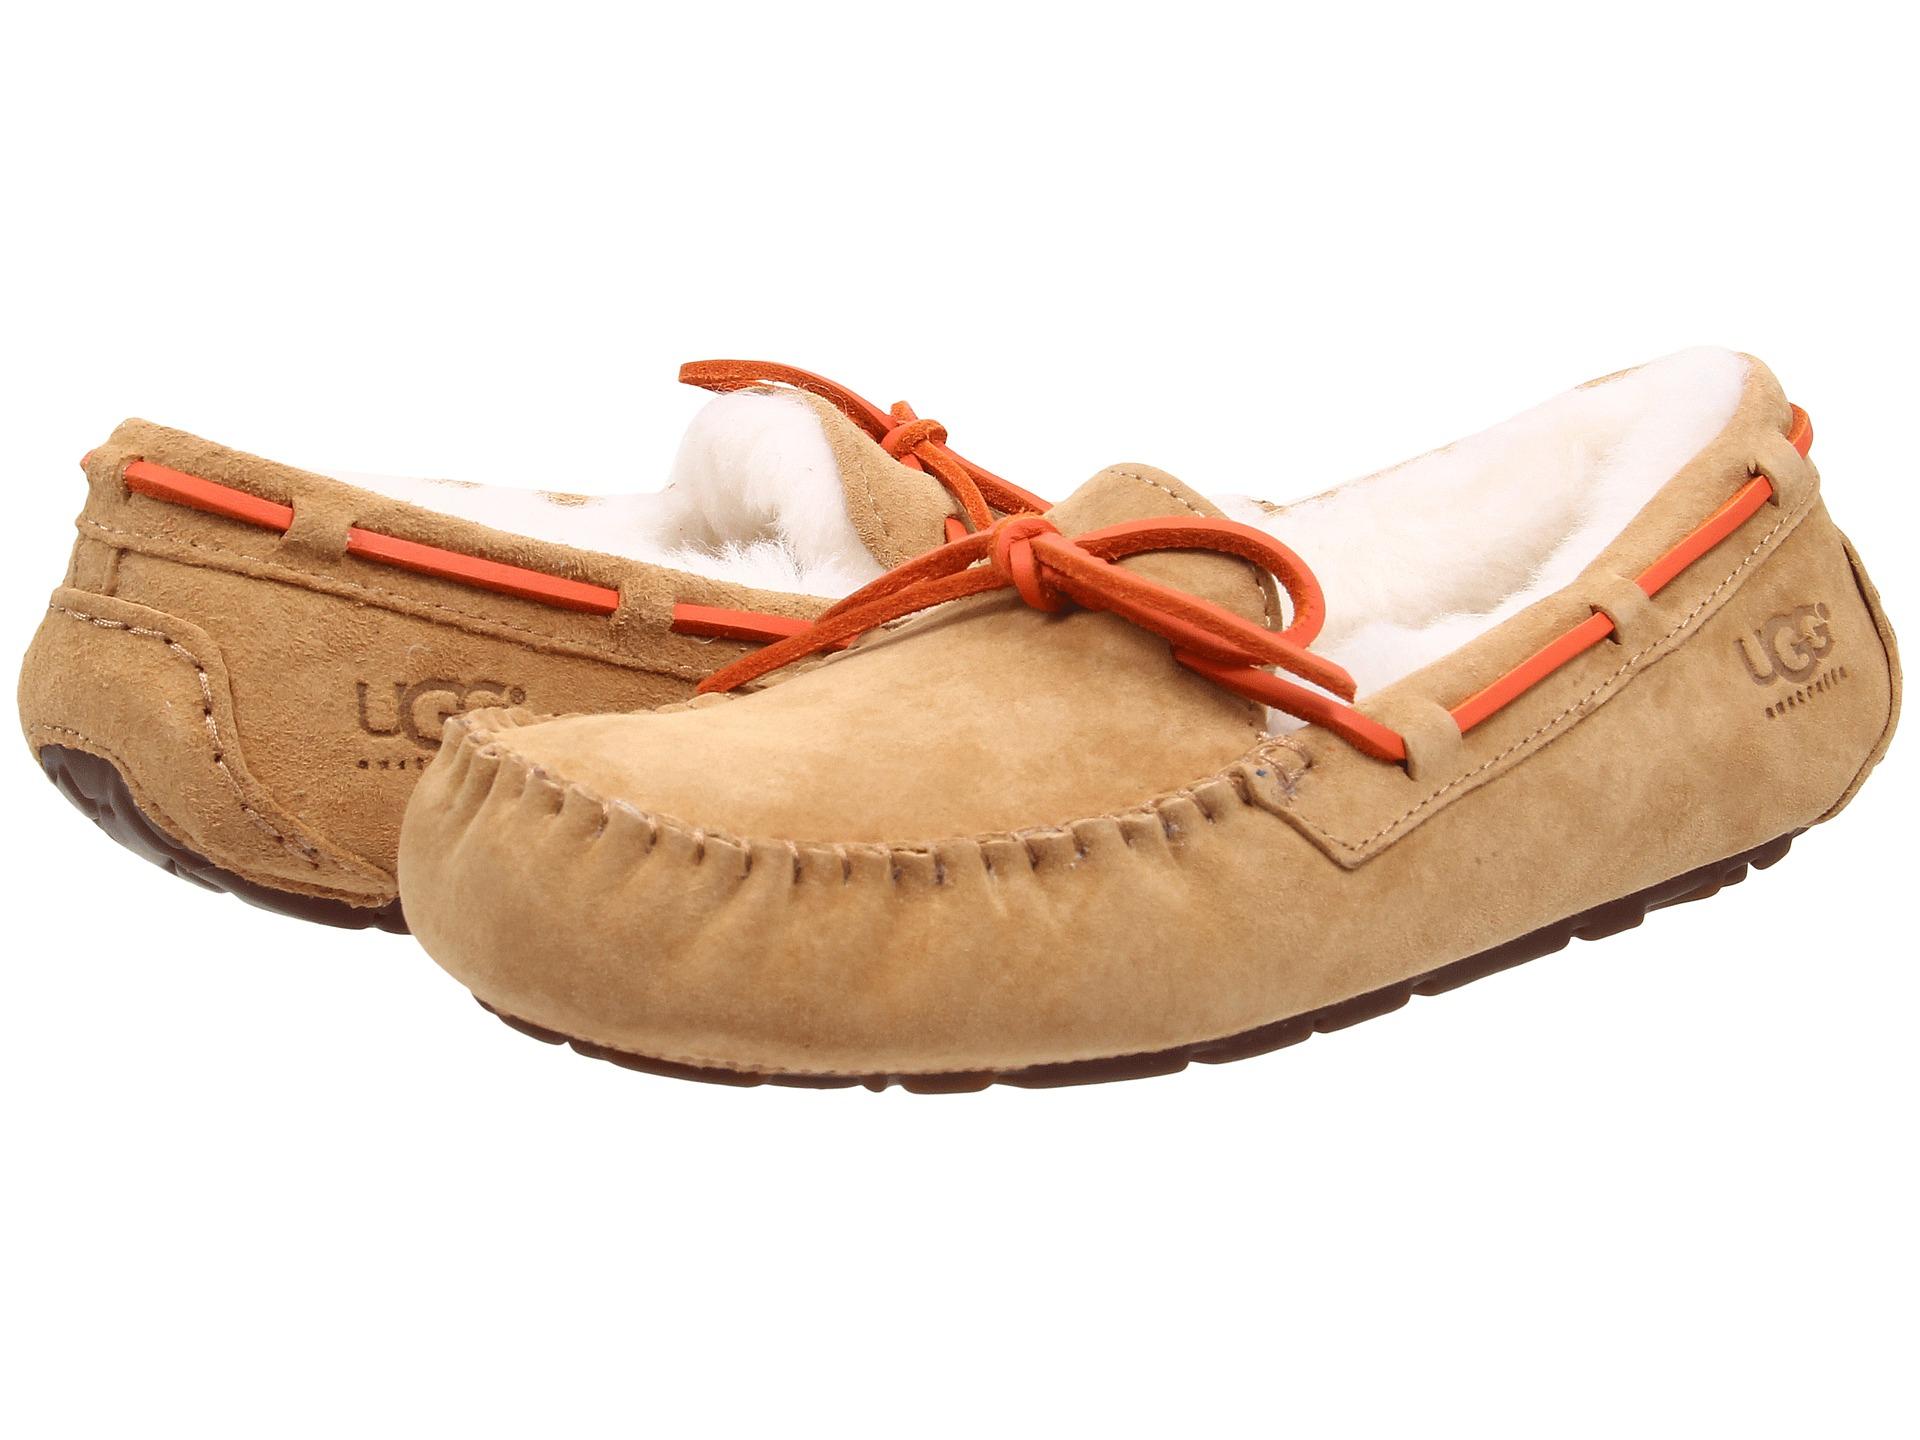 Womens Slippers UGG Dakota Tawny Water Resistant Suede